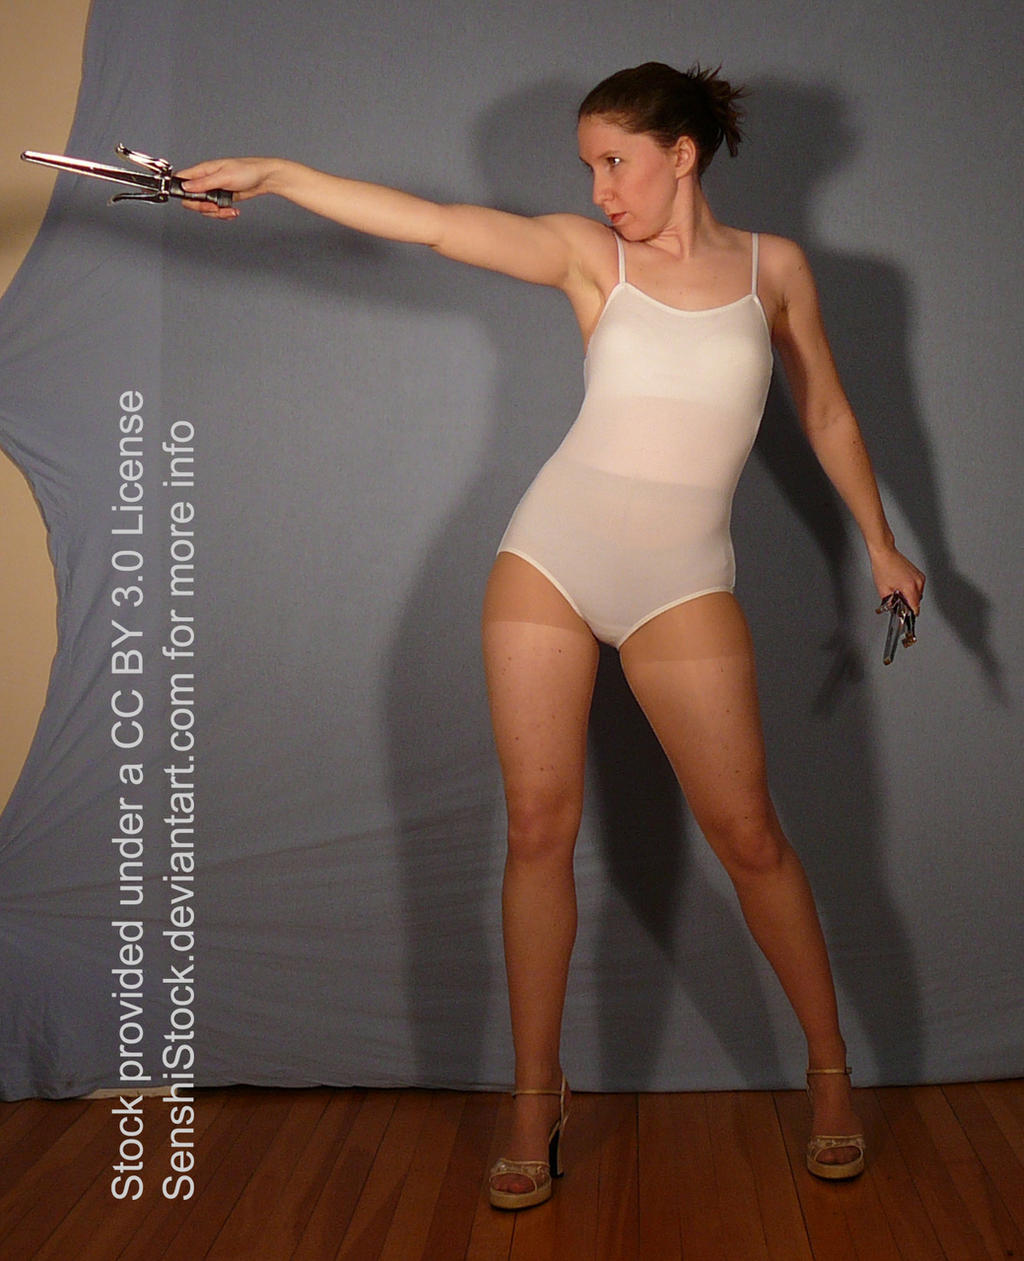 Action Figure Female Design Template